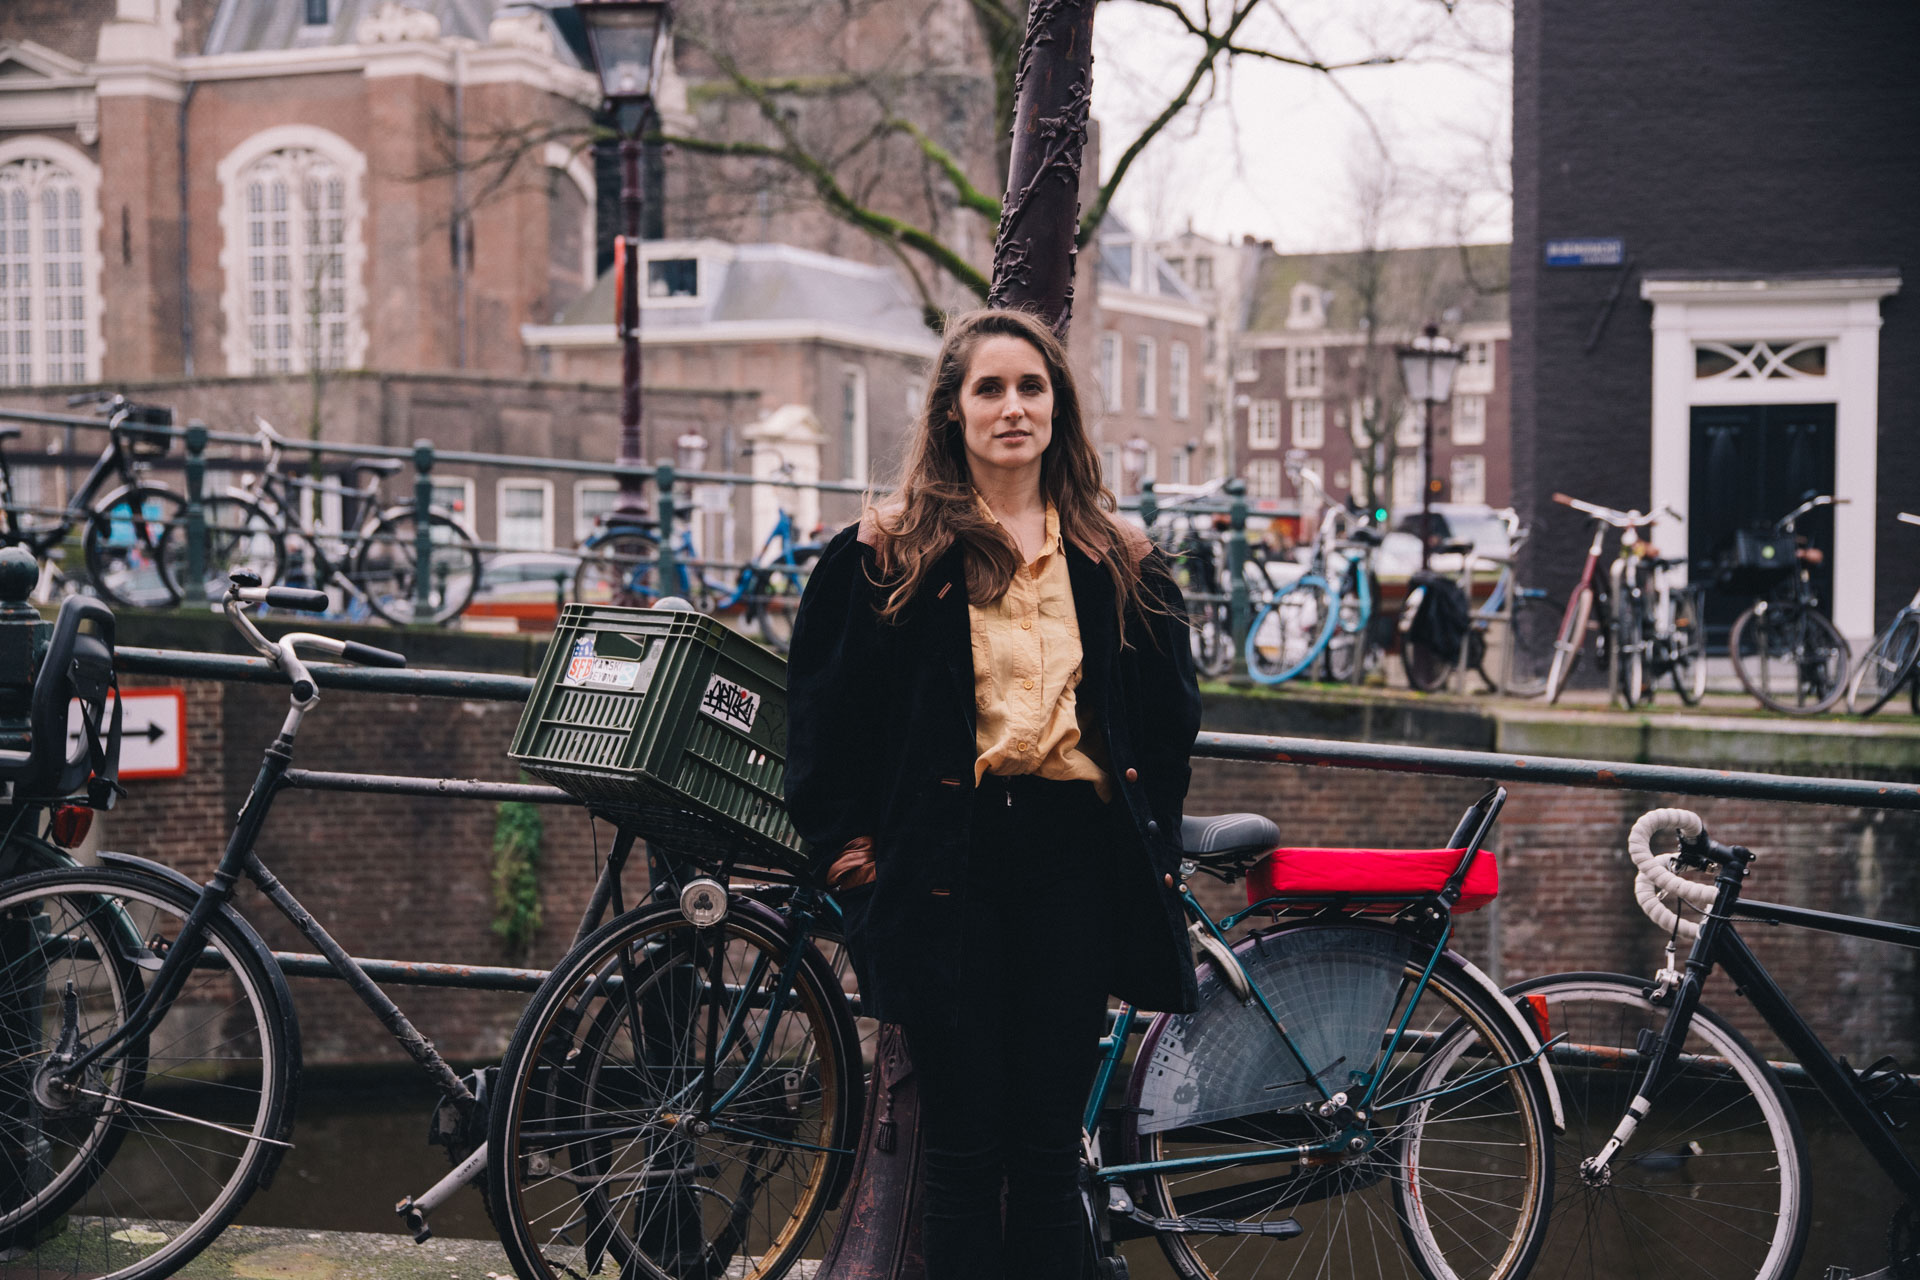 Lewin (Photo by Matthijs van der Ven for The Influences)